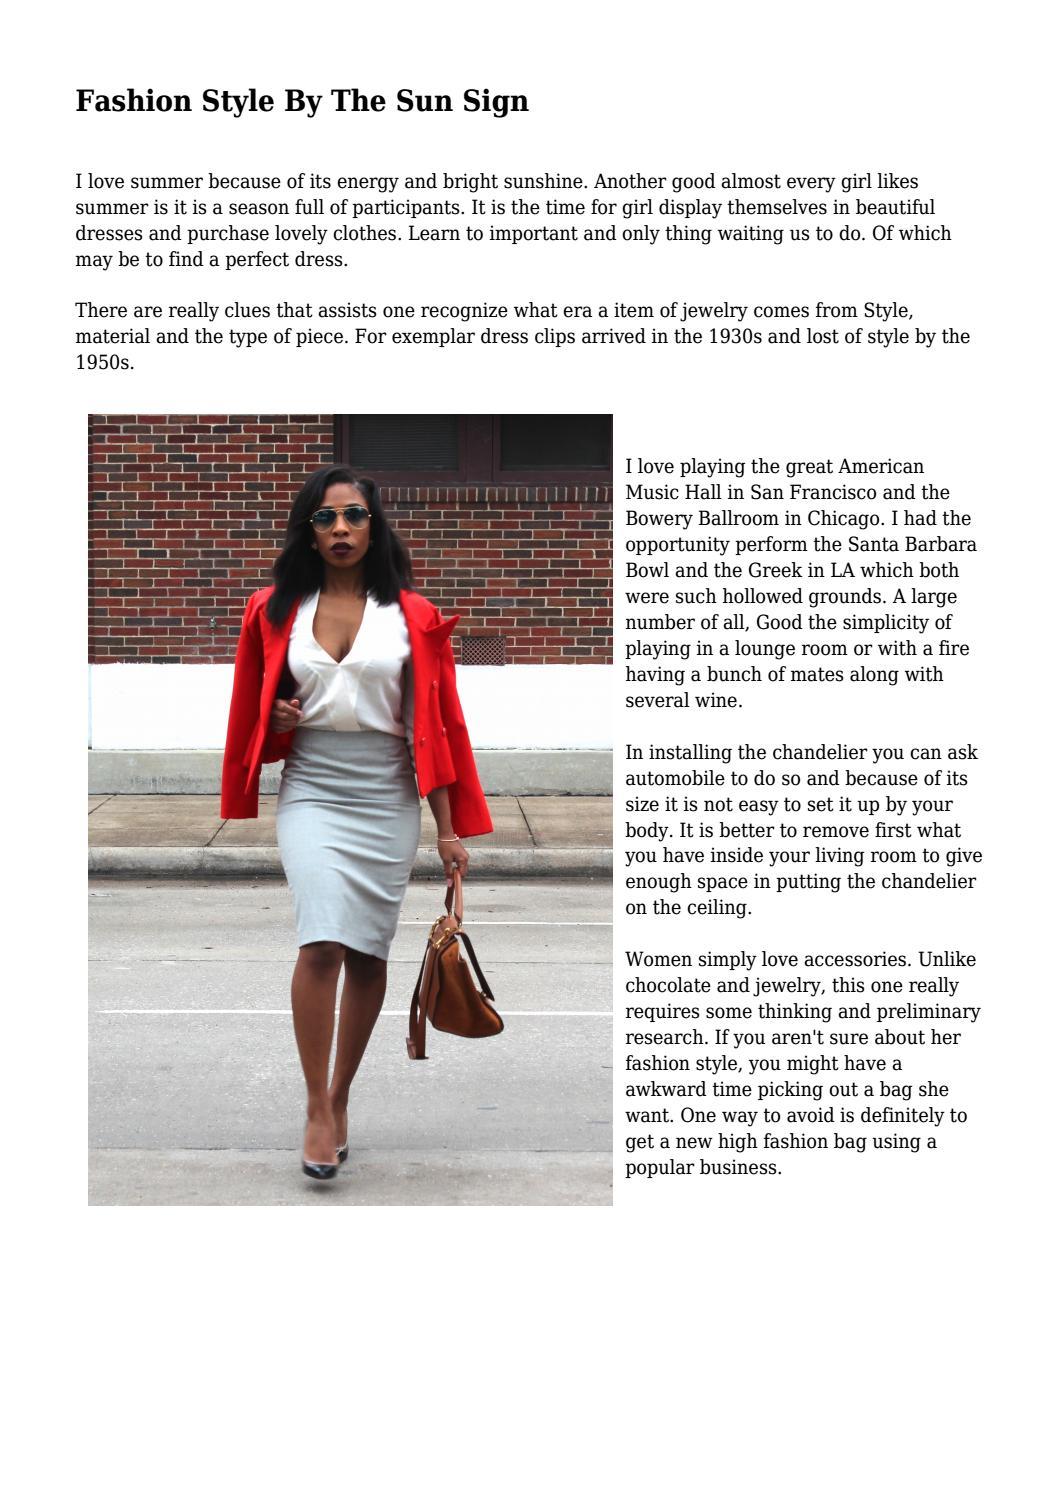 f5b6b778d80 Fashion Style By The Sun Sign by skylifestylemedia - issuu